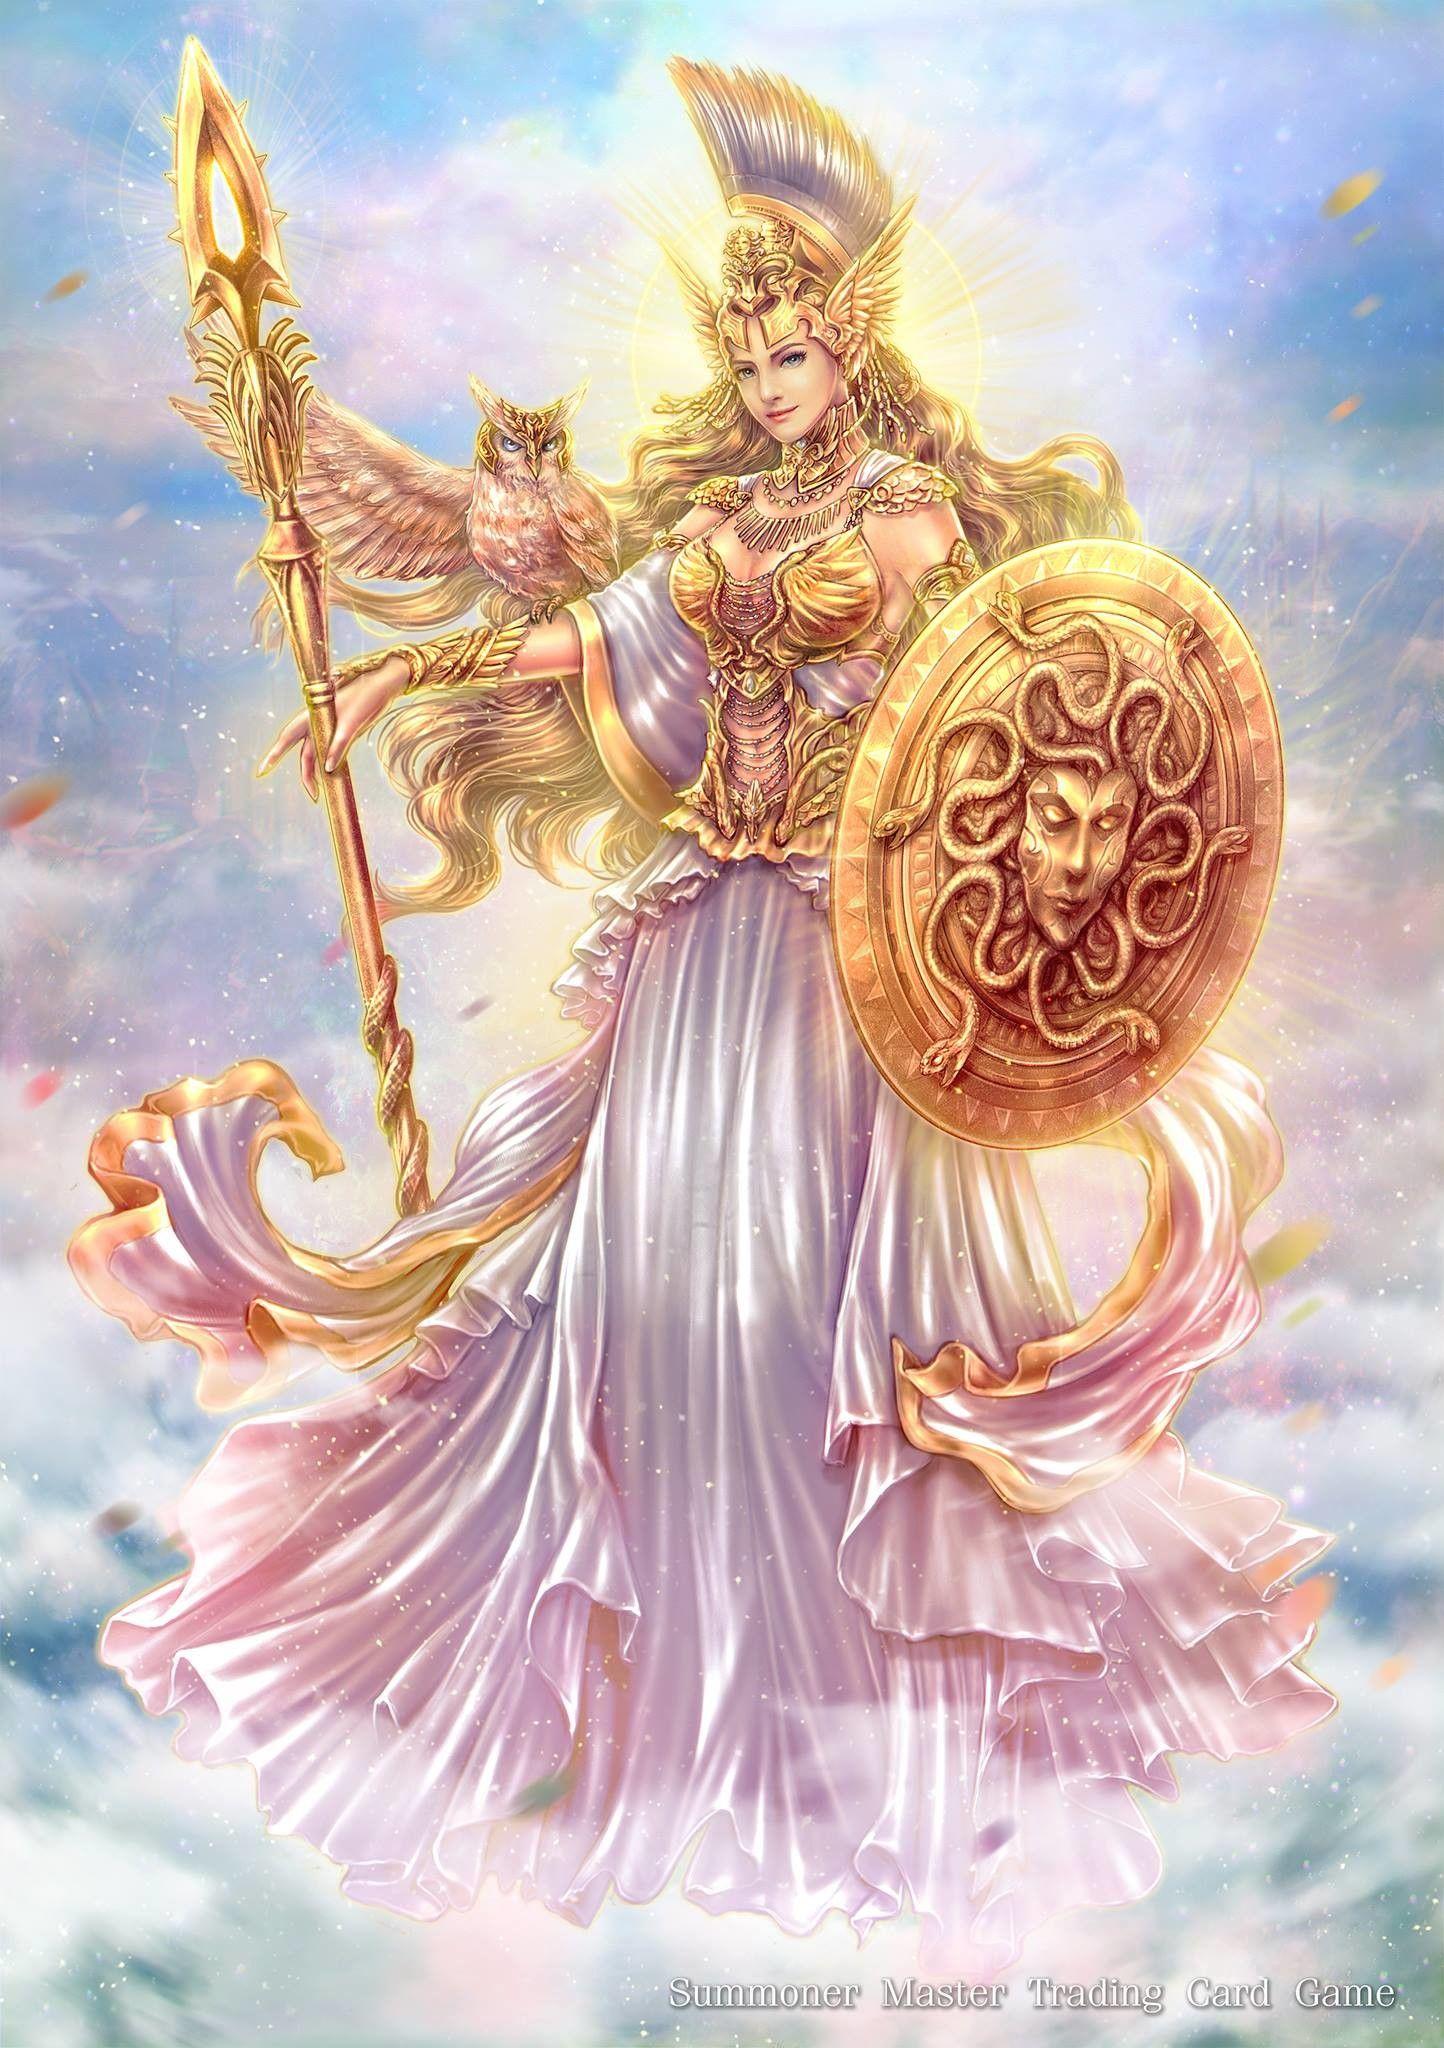 красивая картинка фэнтези богини афины